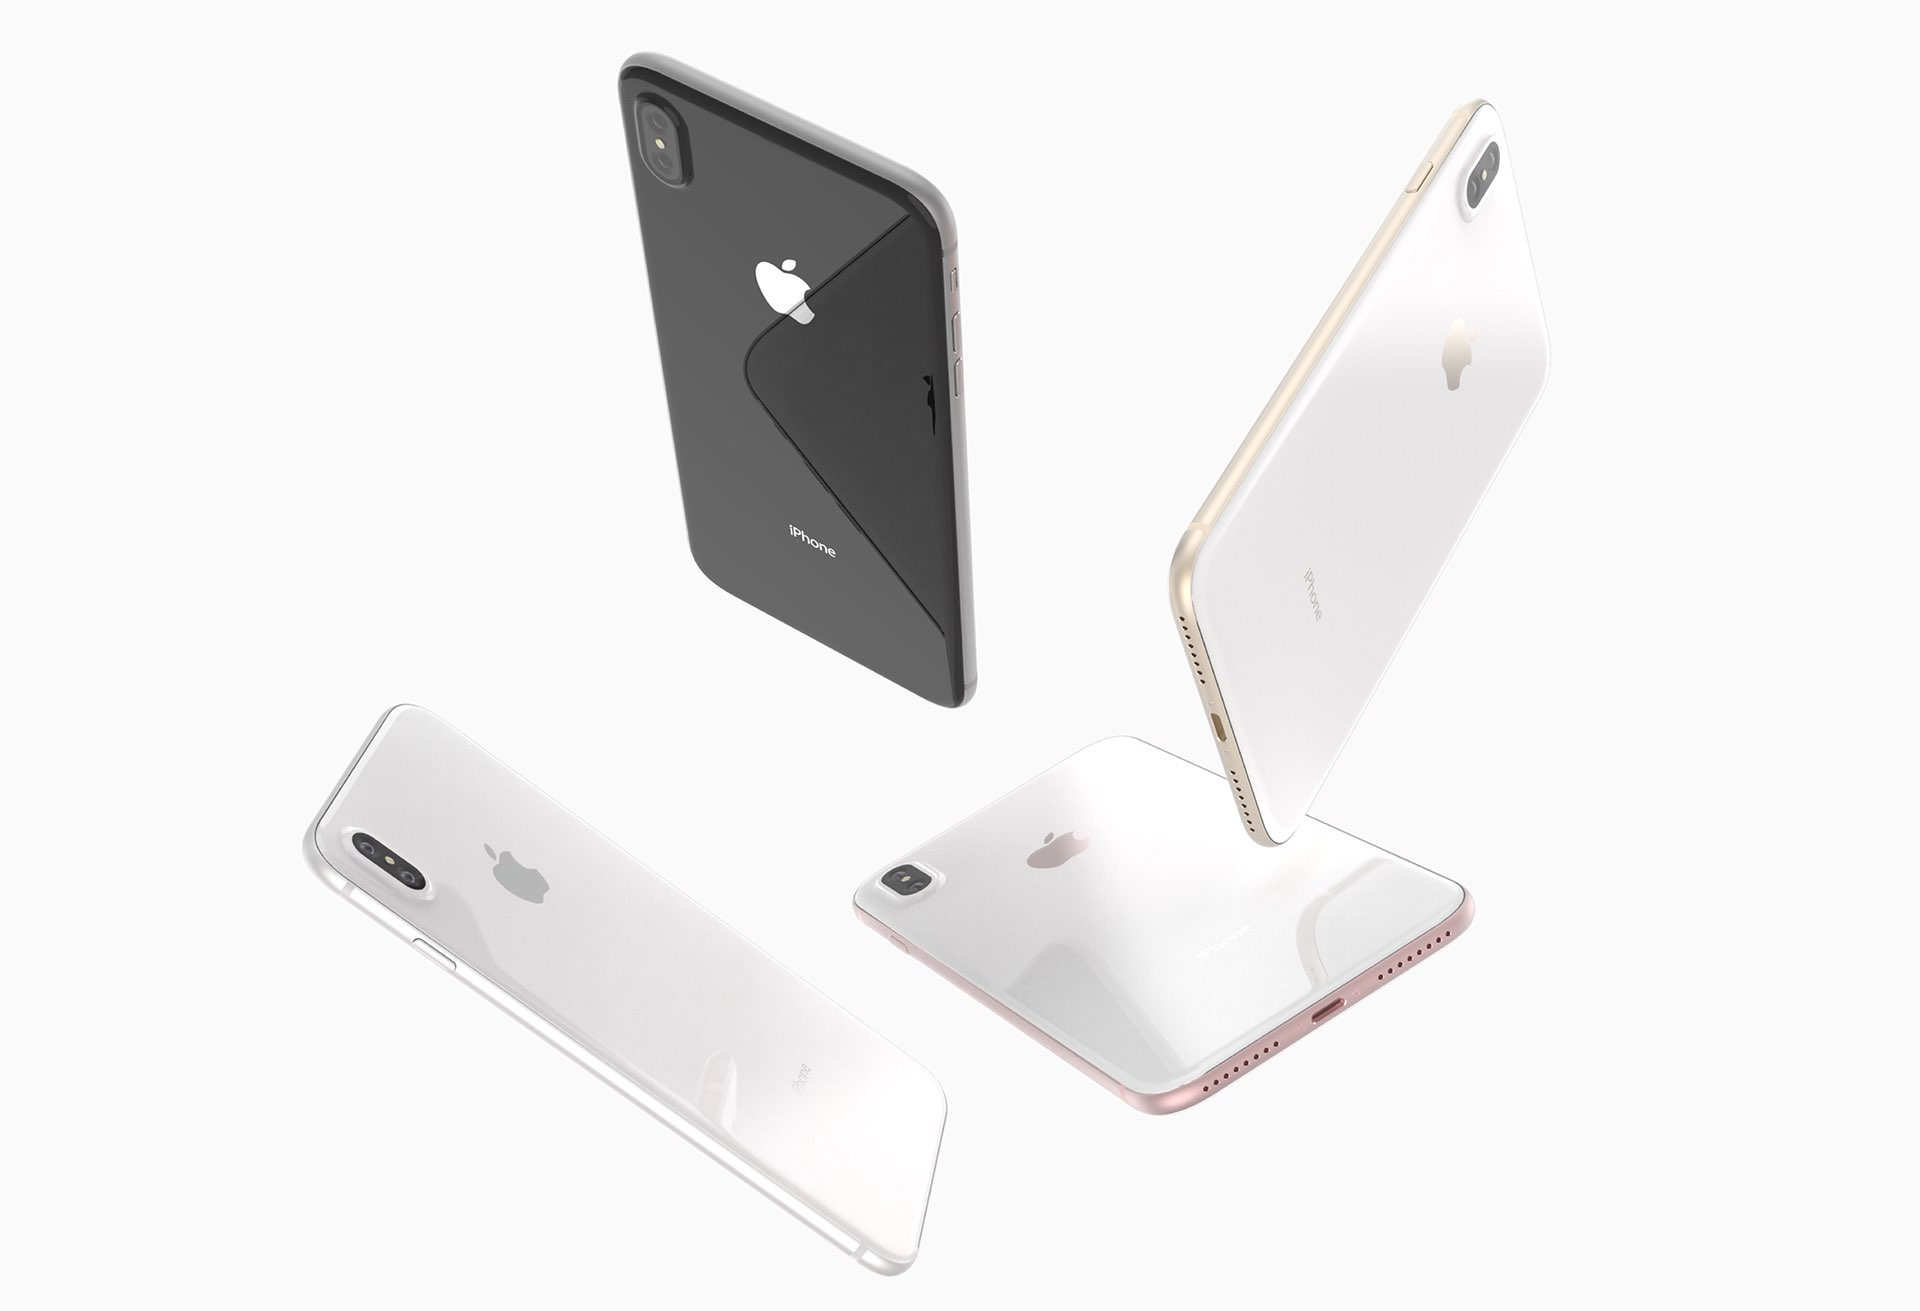 iPhone 8 concept Quinton Theron